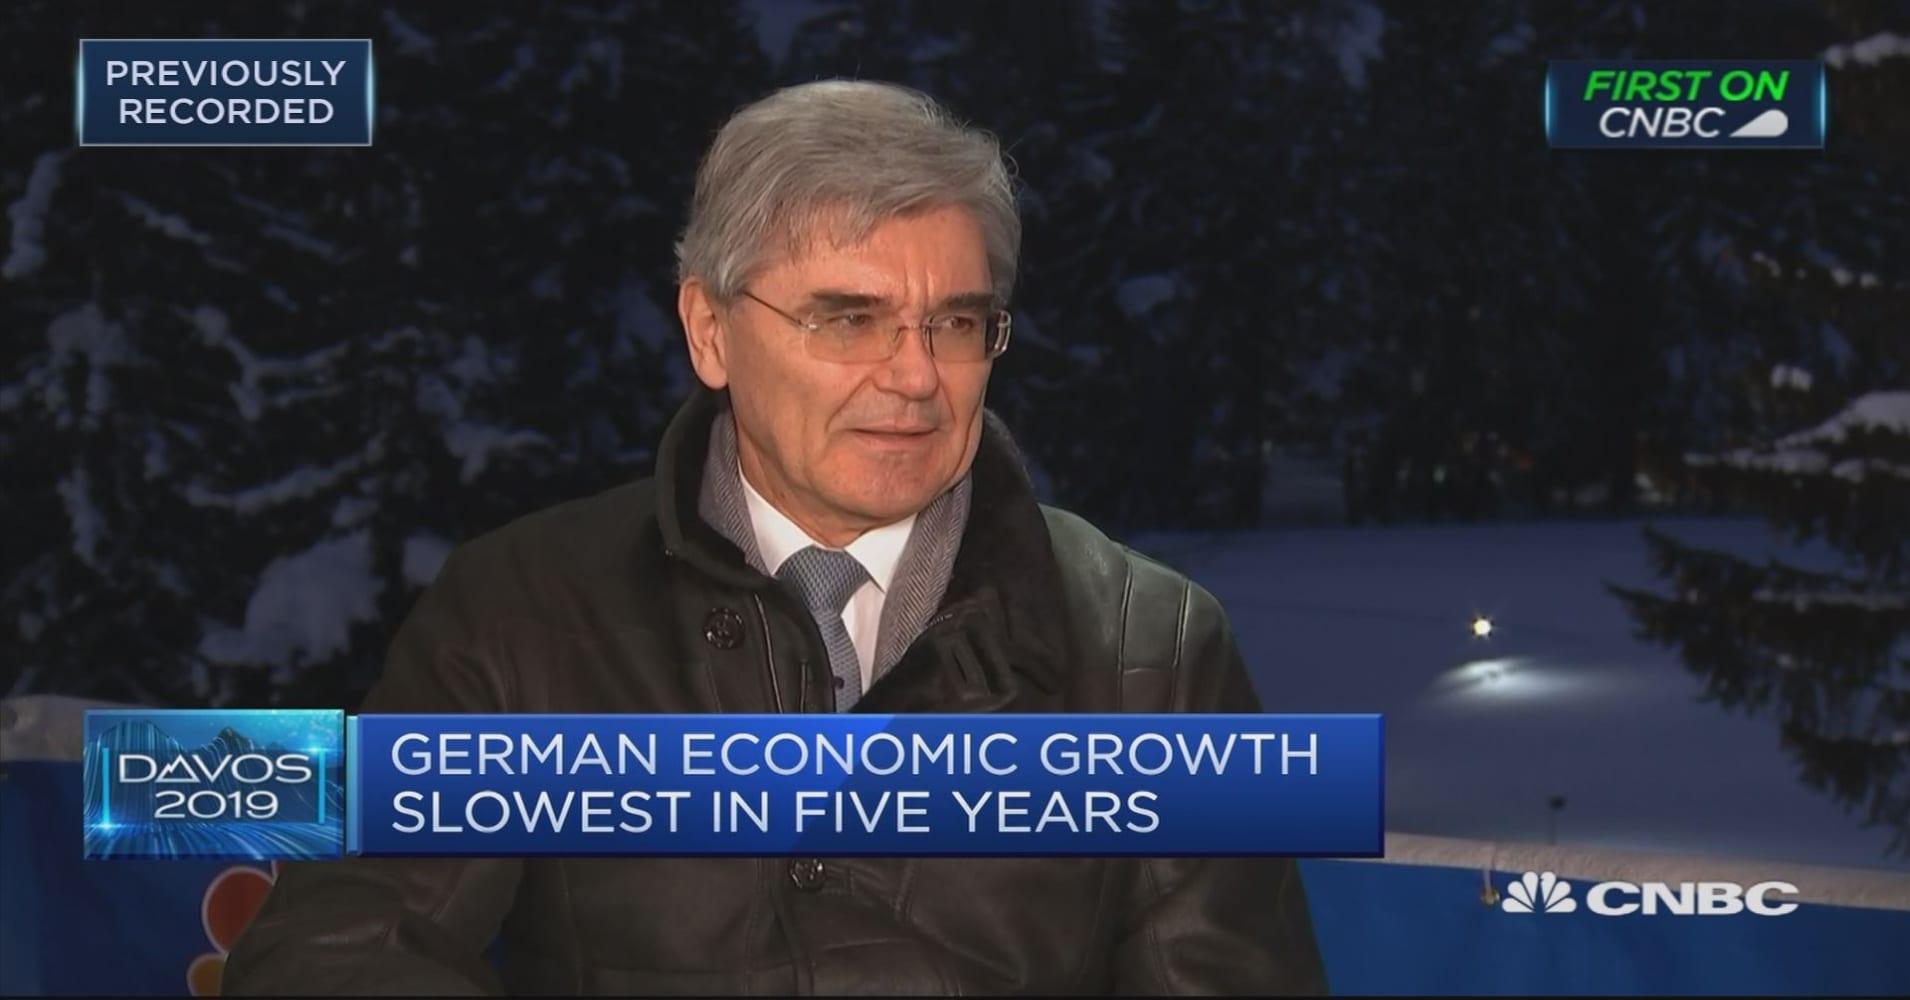 Siemens CEO says he's 'sort of' optimistic that EU regulators will approve Alstom deal